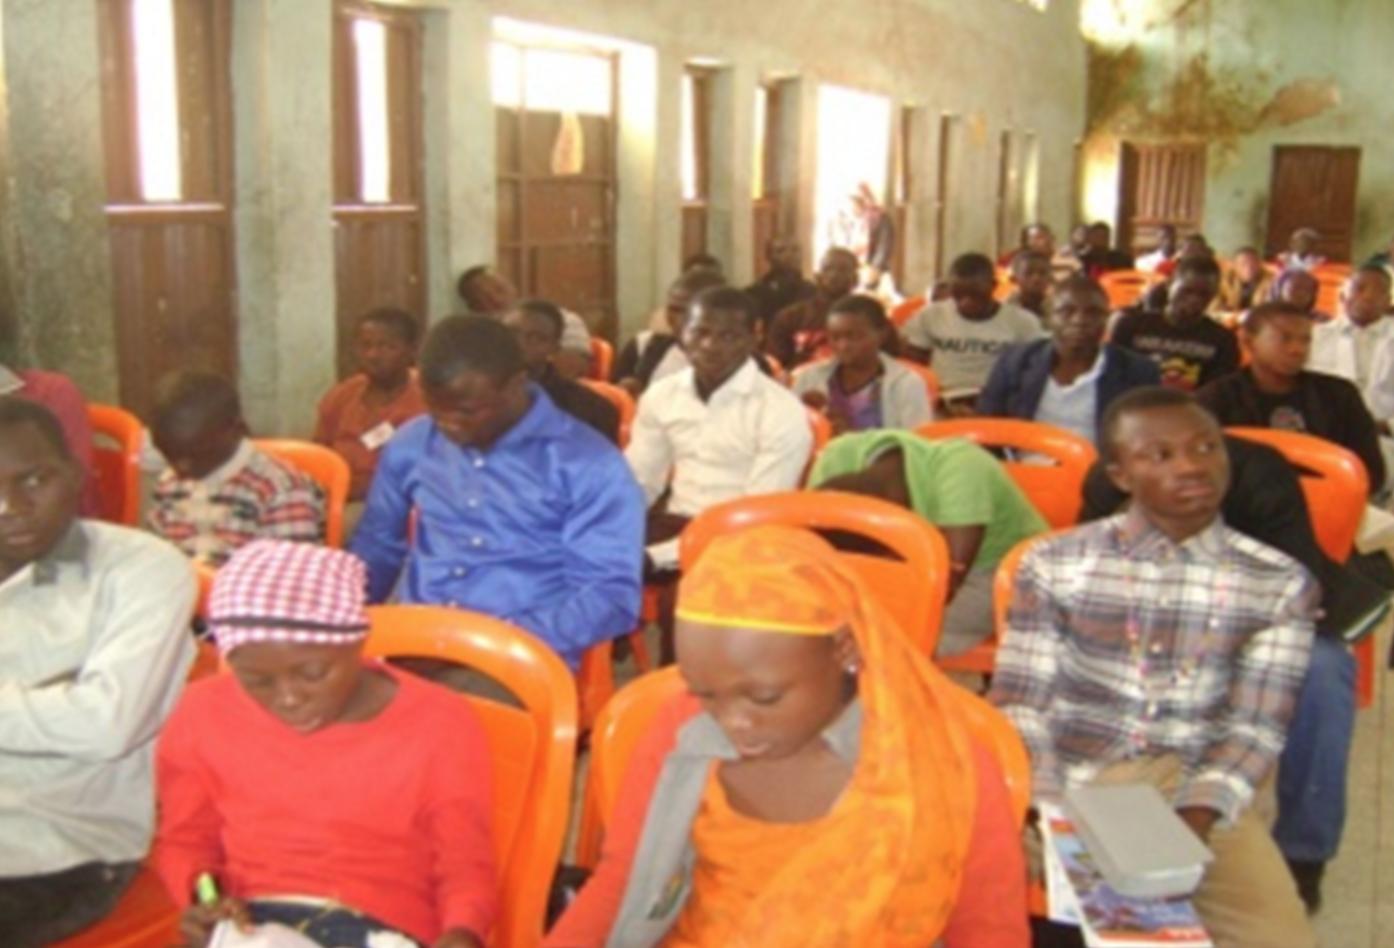 A selection of conference participants — Kaduna, Nigeria